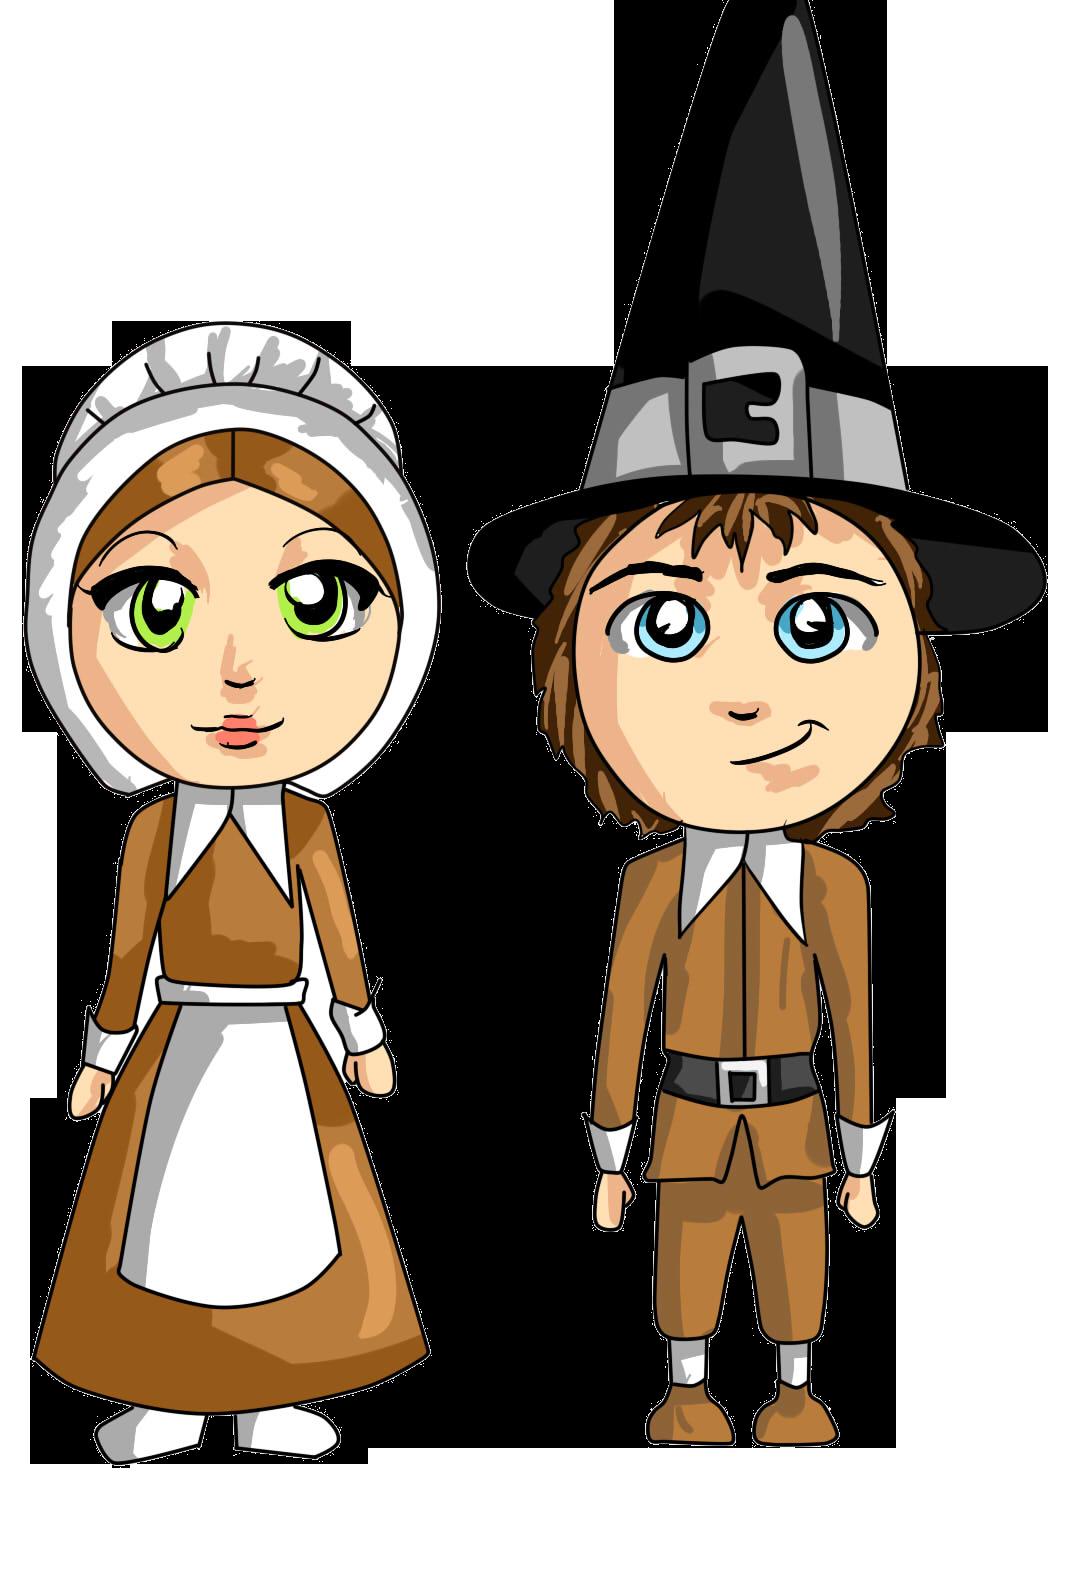 Free clipart pilgrims thanksgiving png free download Free Pilgrims Thanksgiving Cliparts, Download Free Clip Art, Free ... png free download